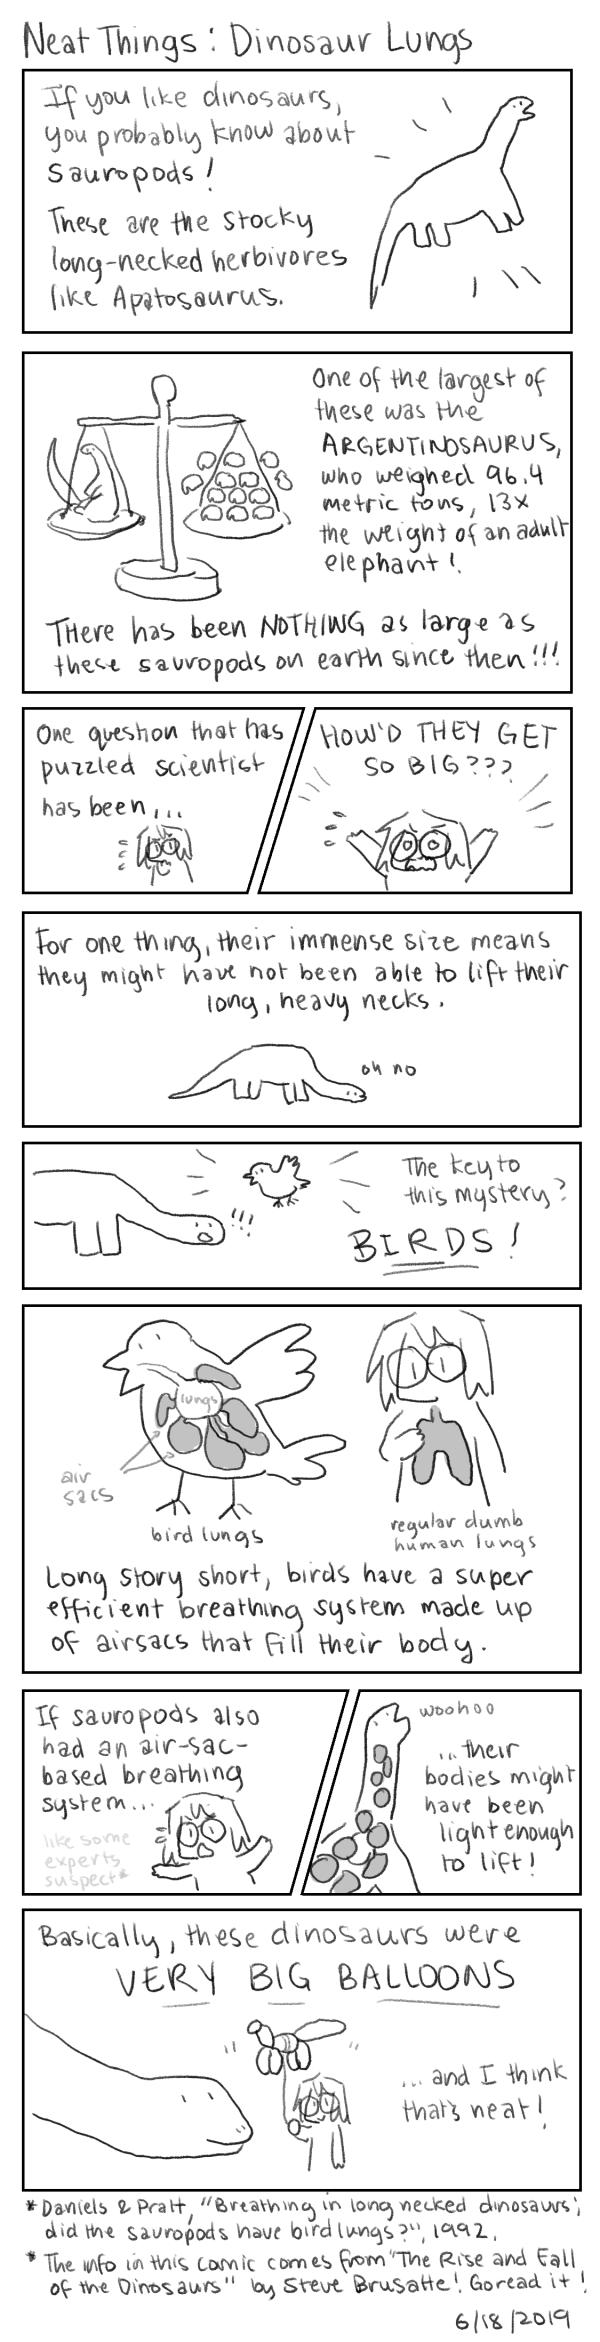 Neat Things: Dinosaur Lungs